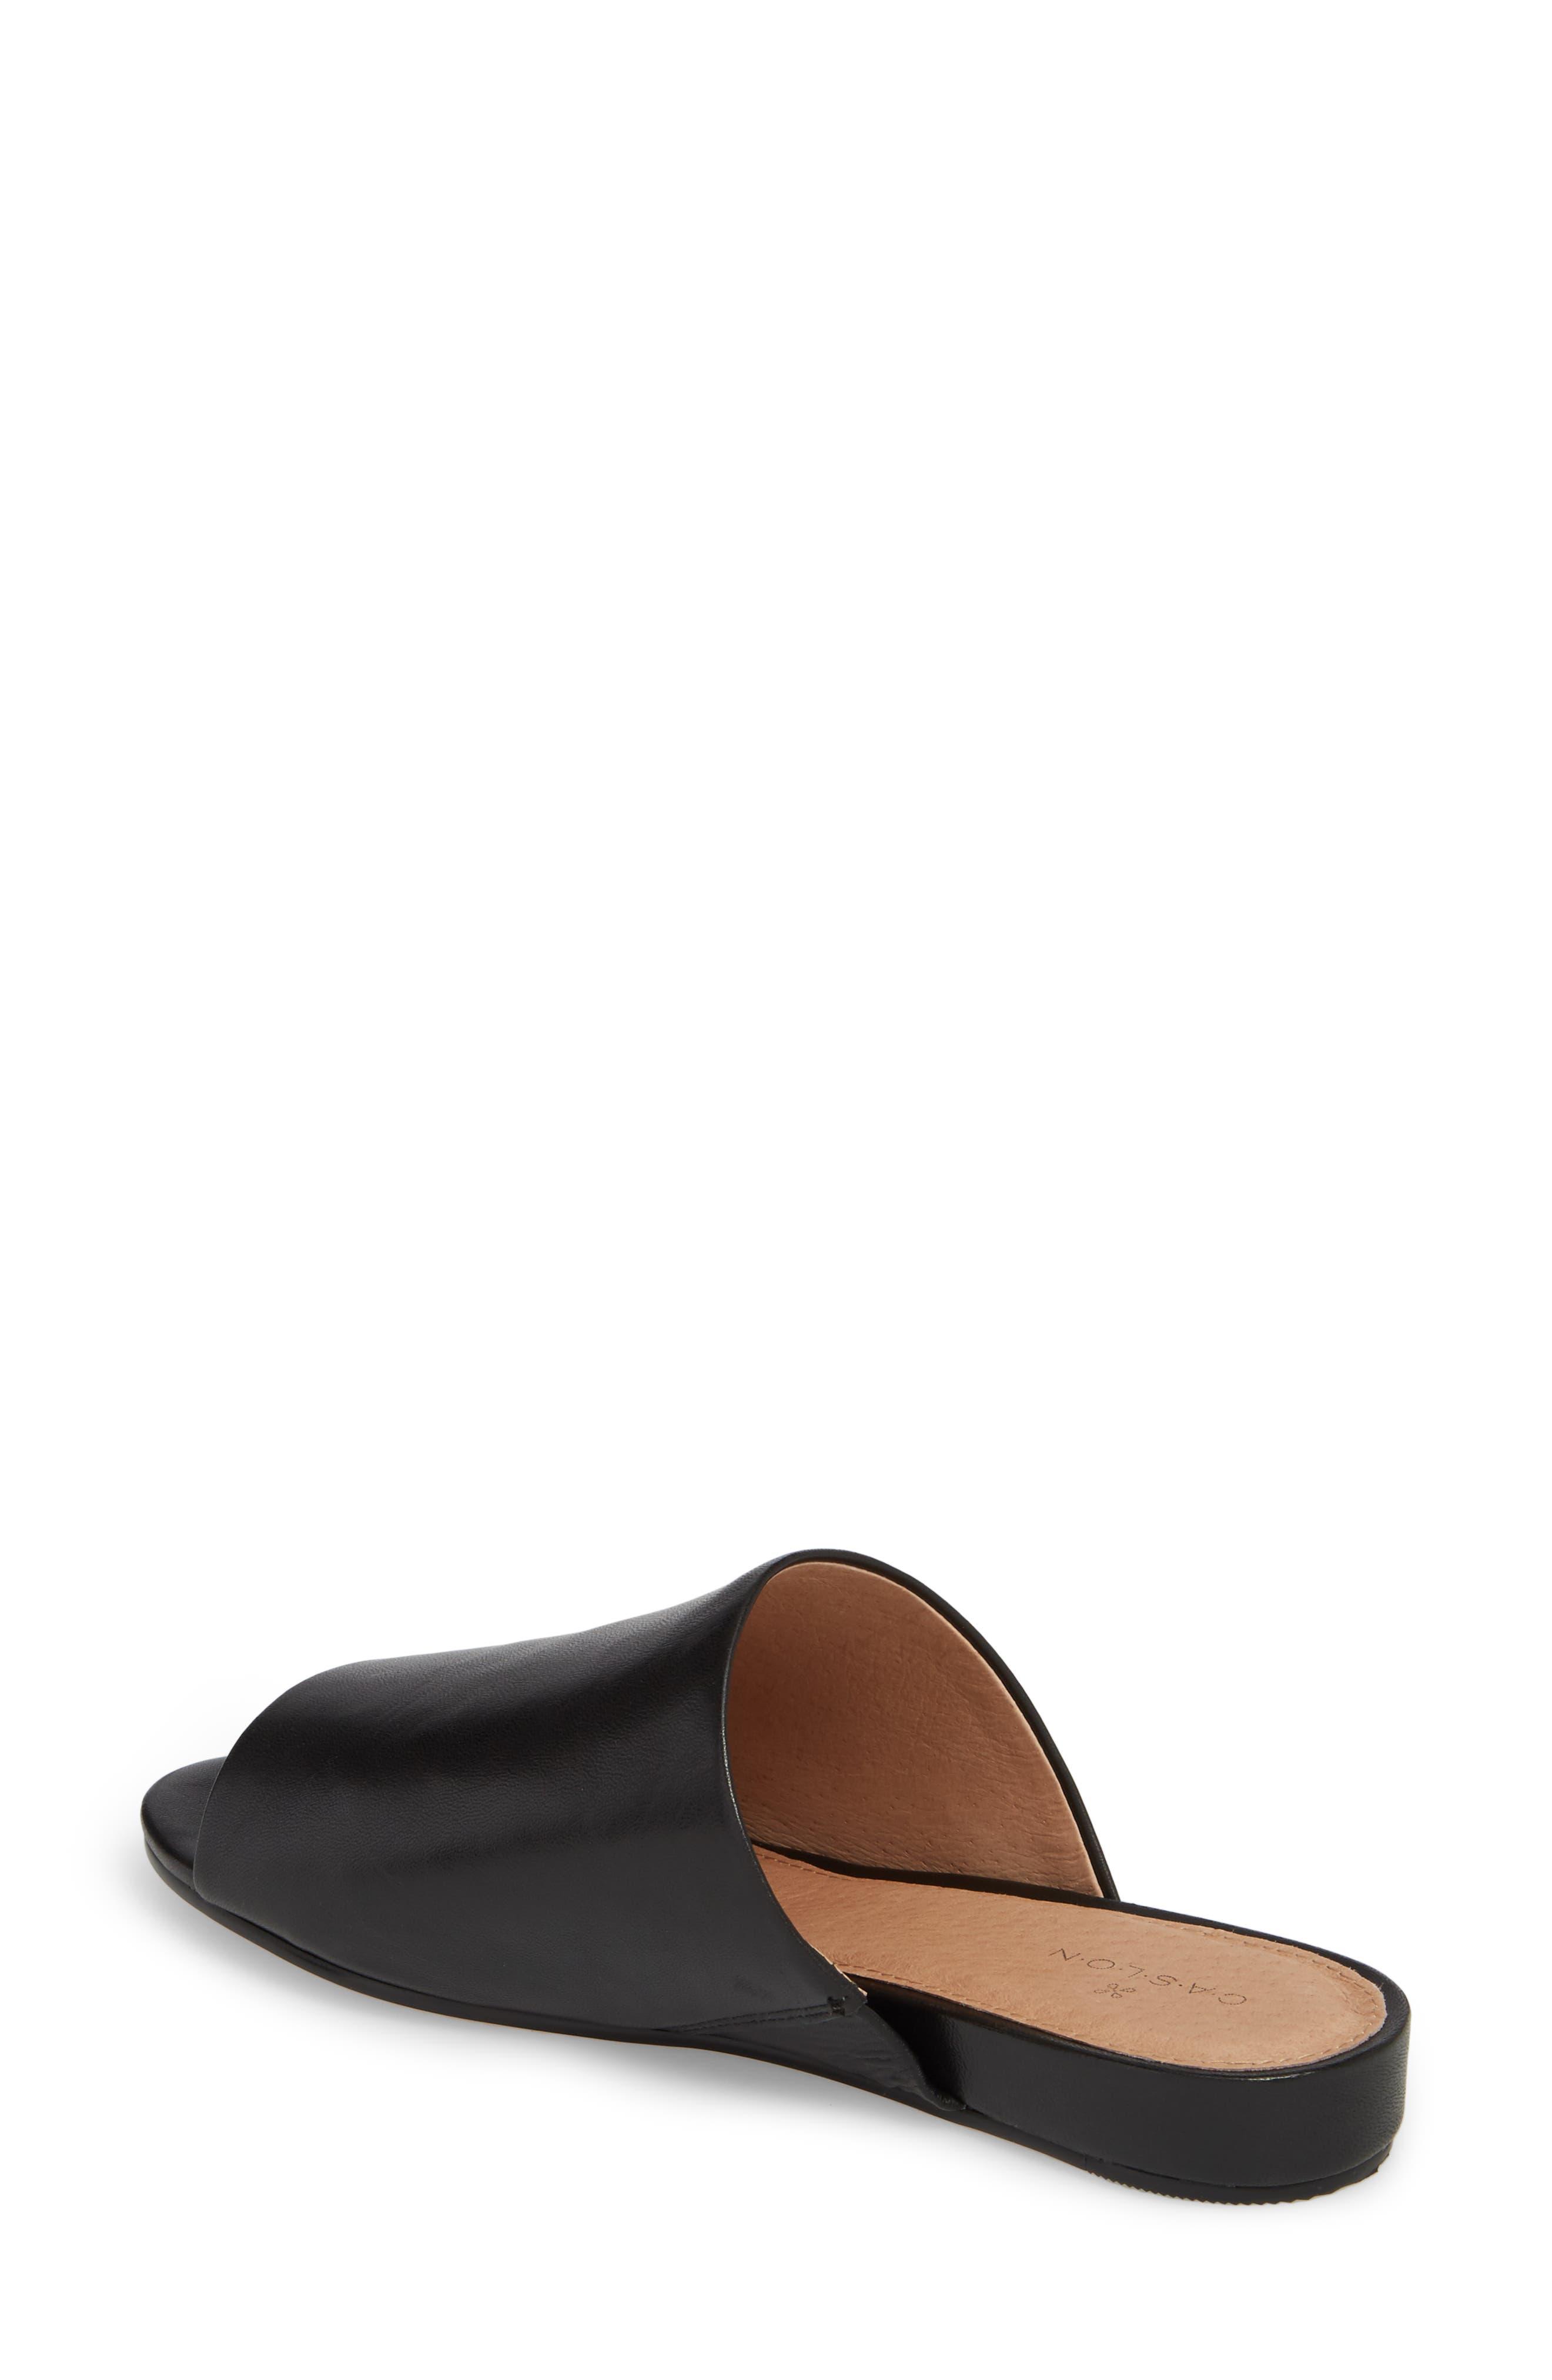 Kiana Slide Sandal,                             Alternate thumbnail 2, color,                             001